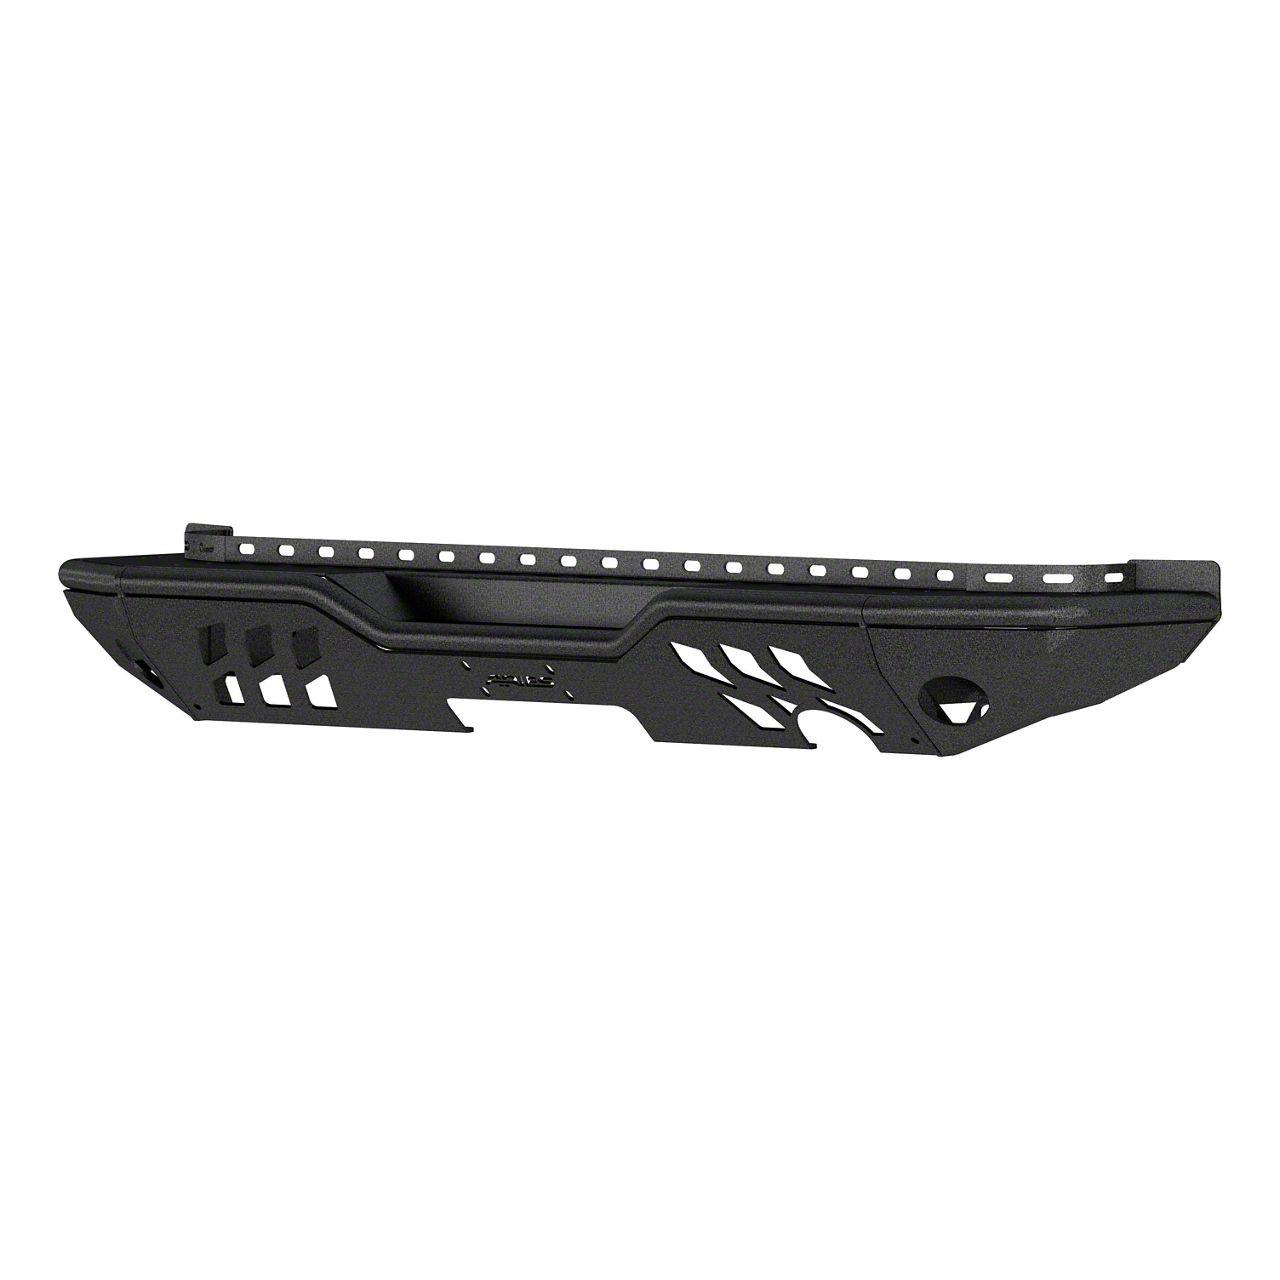 Aries Automotive TrailChaser Steel Full Width Rear Bumper - Textured Black (07-18 Jeep Wrangler JK)